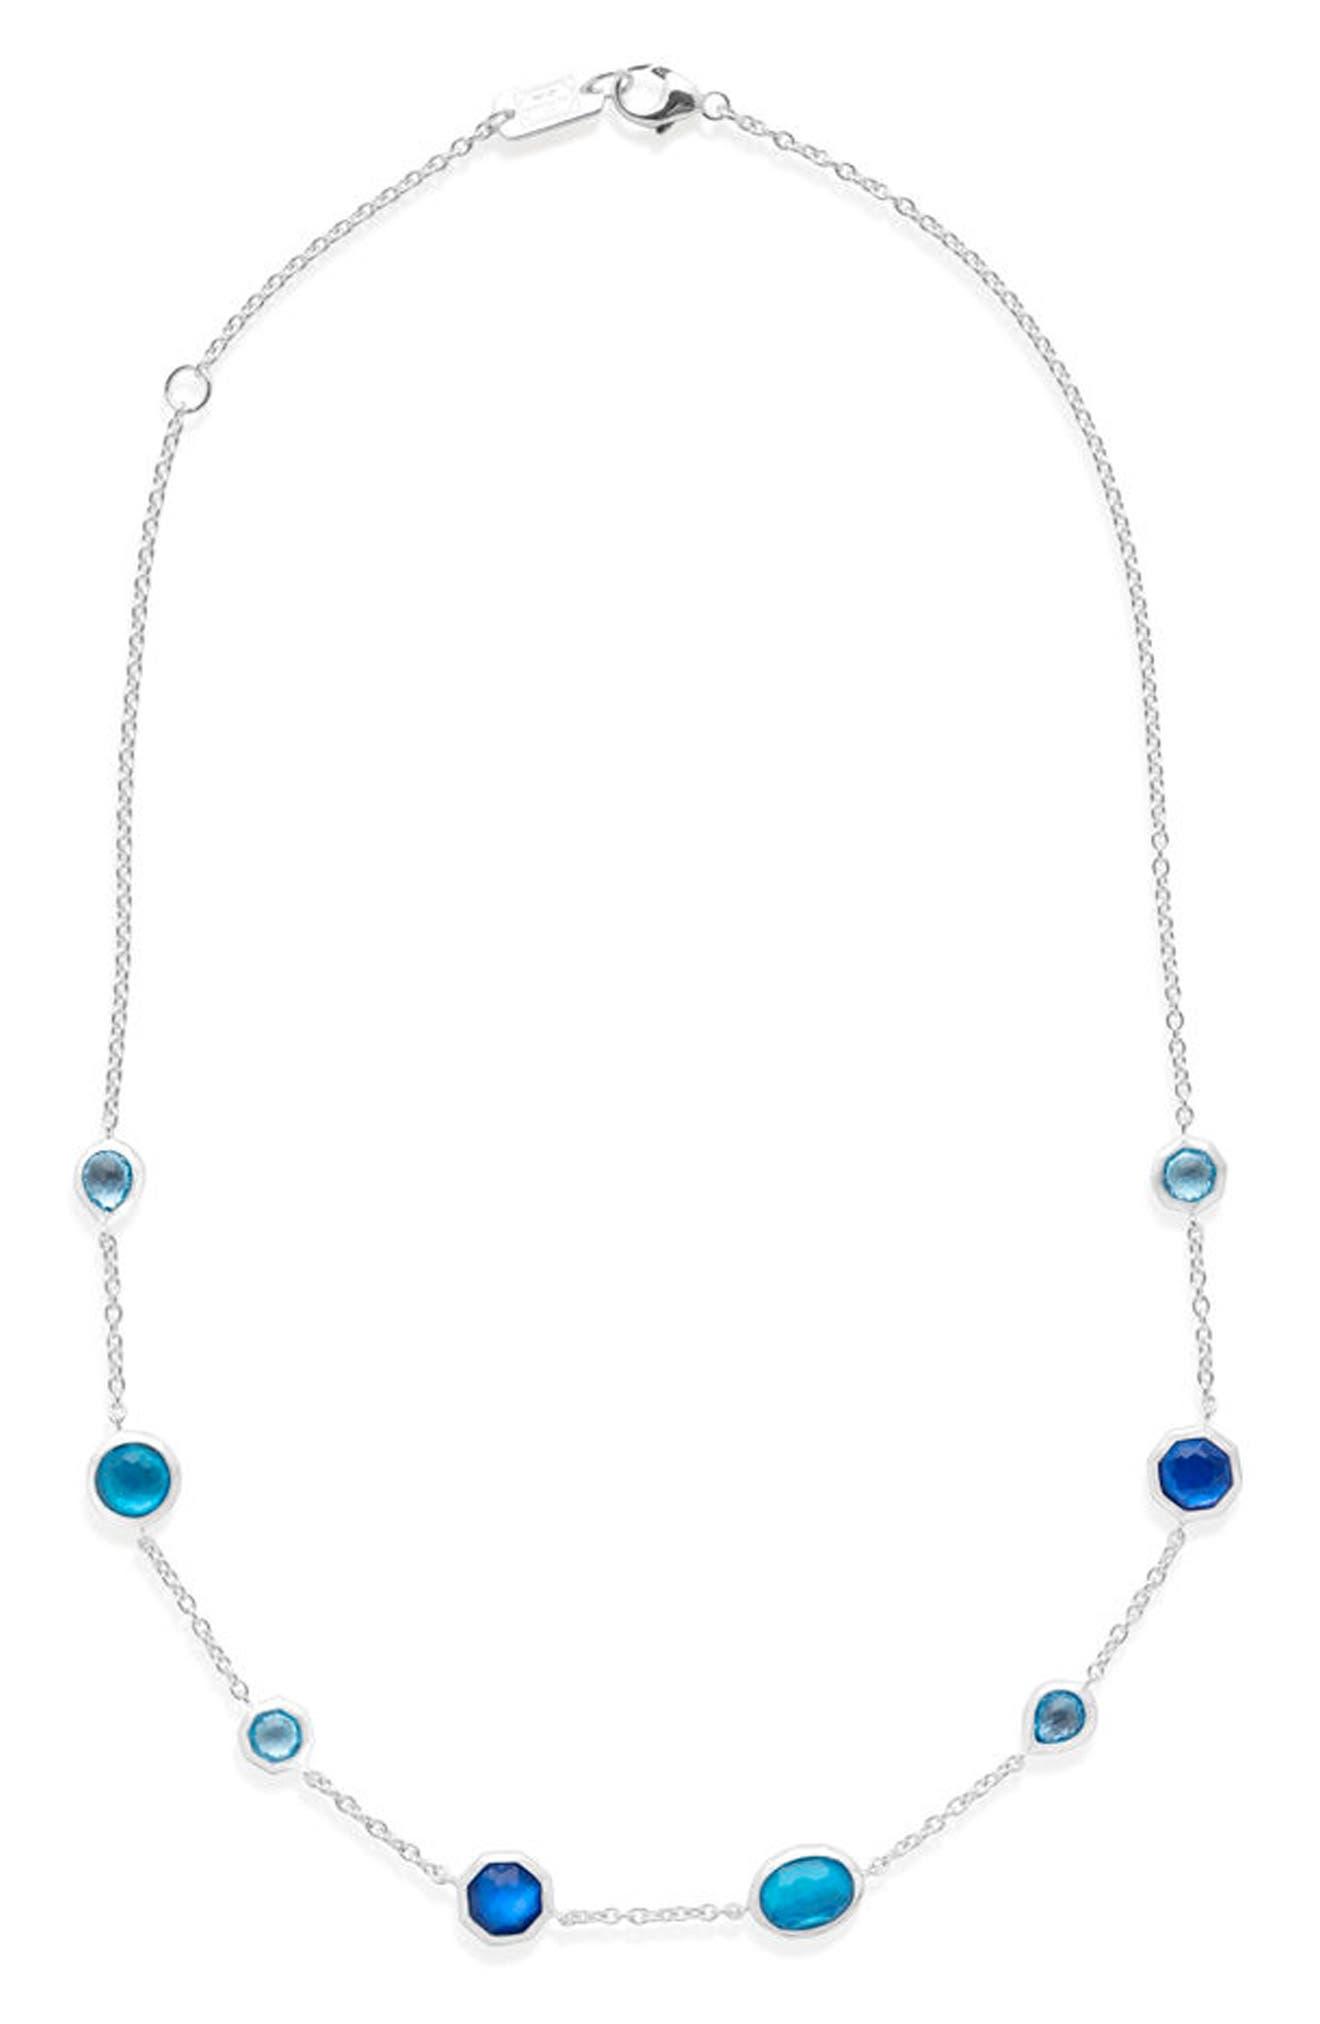 Wonderland Station Necklace,                             Main thumbnail 1, color,                             BLUE